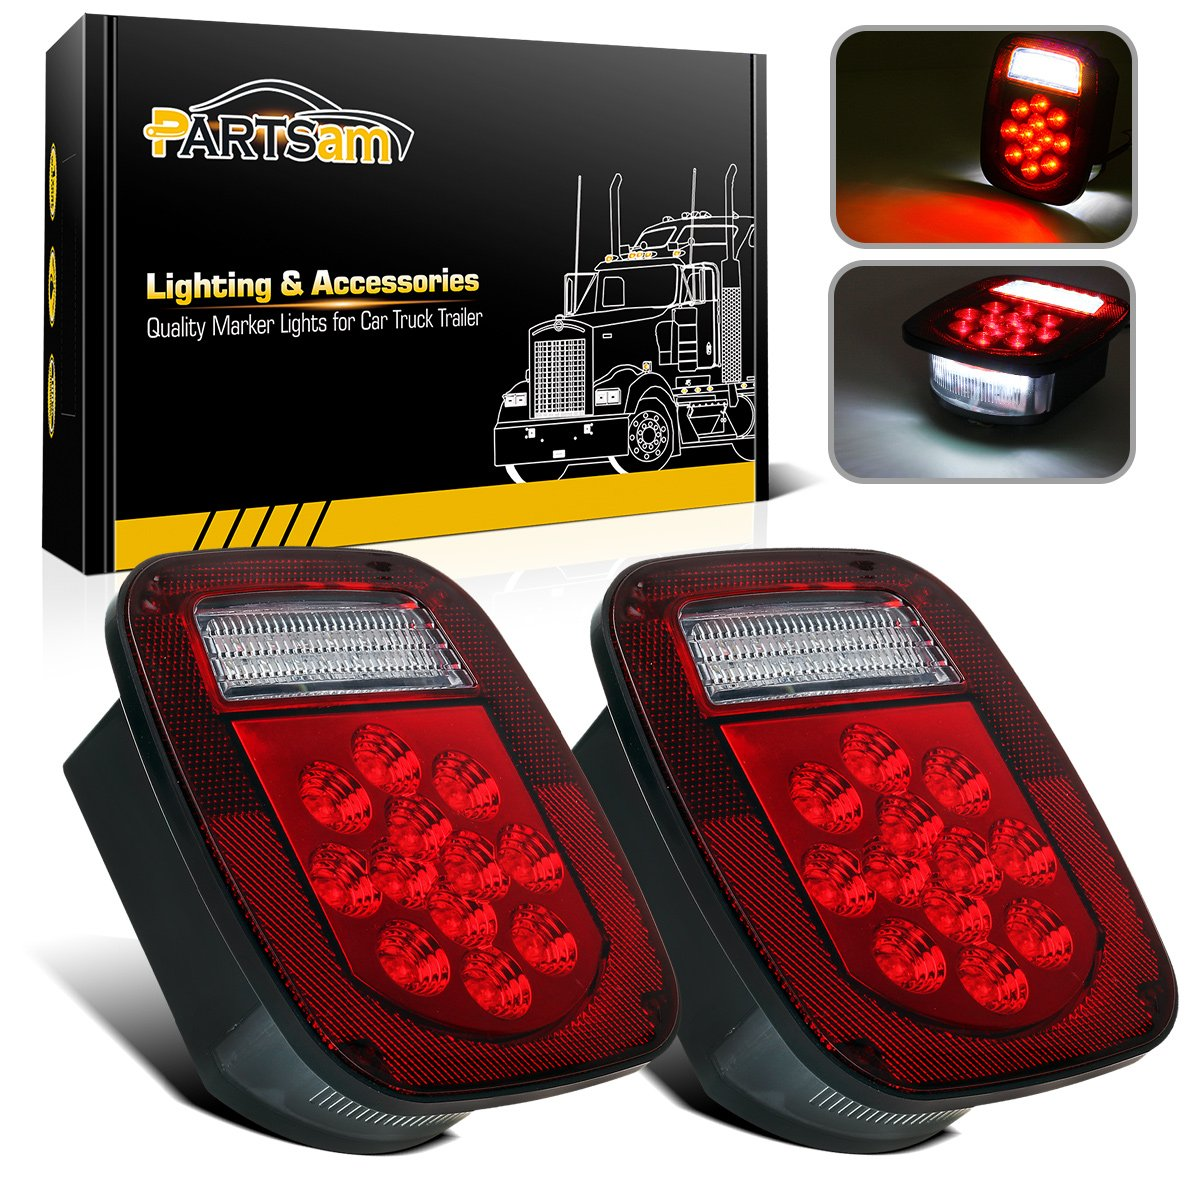 Partsam 2x Red / White 39LED Stop Turn Tail Stud Lights for Truck Trailer Boat RV Jeep TJ CJ YJ JK